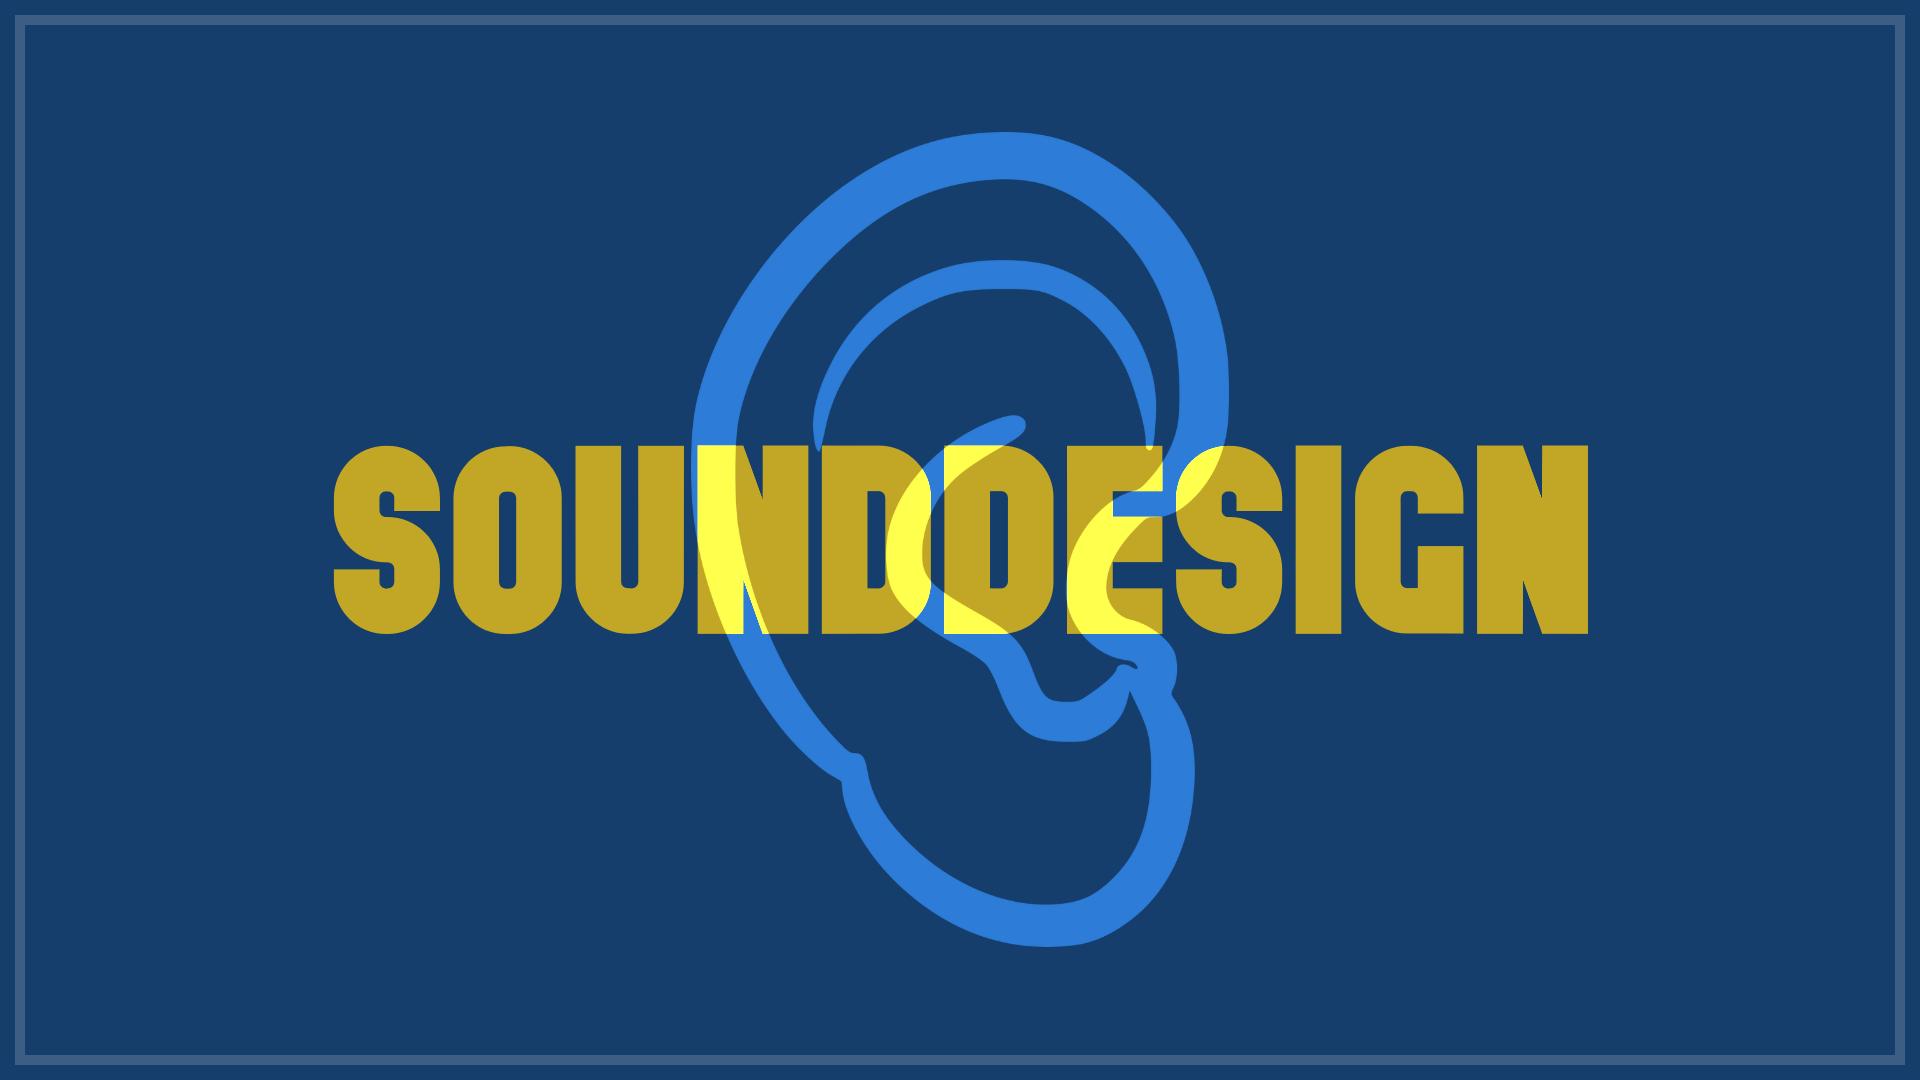 Sounddesign Pic